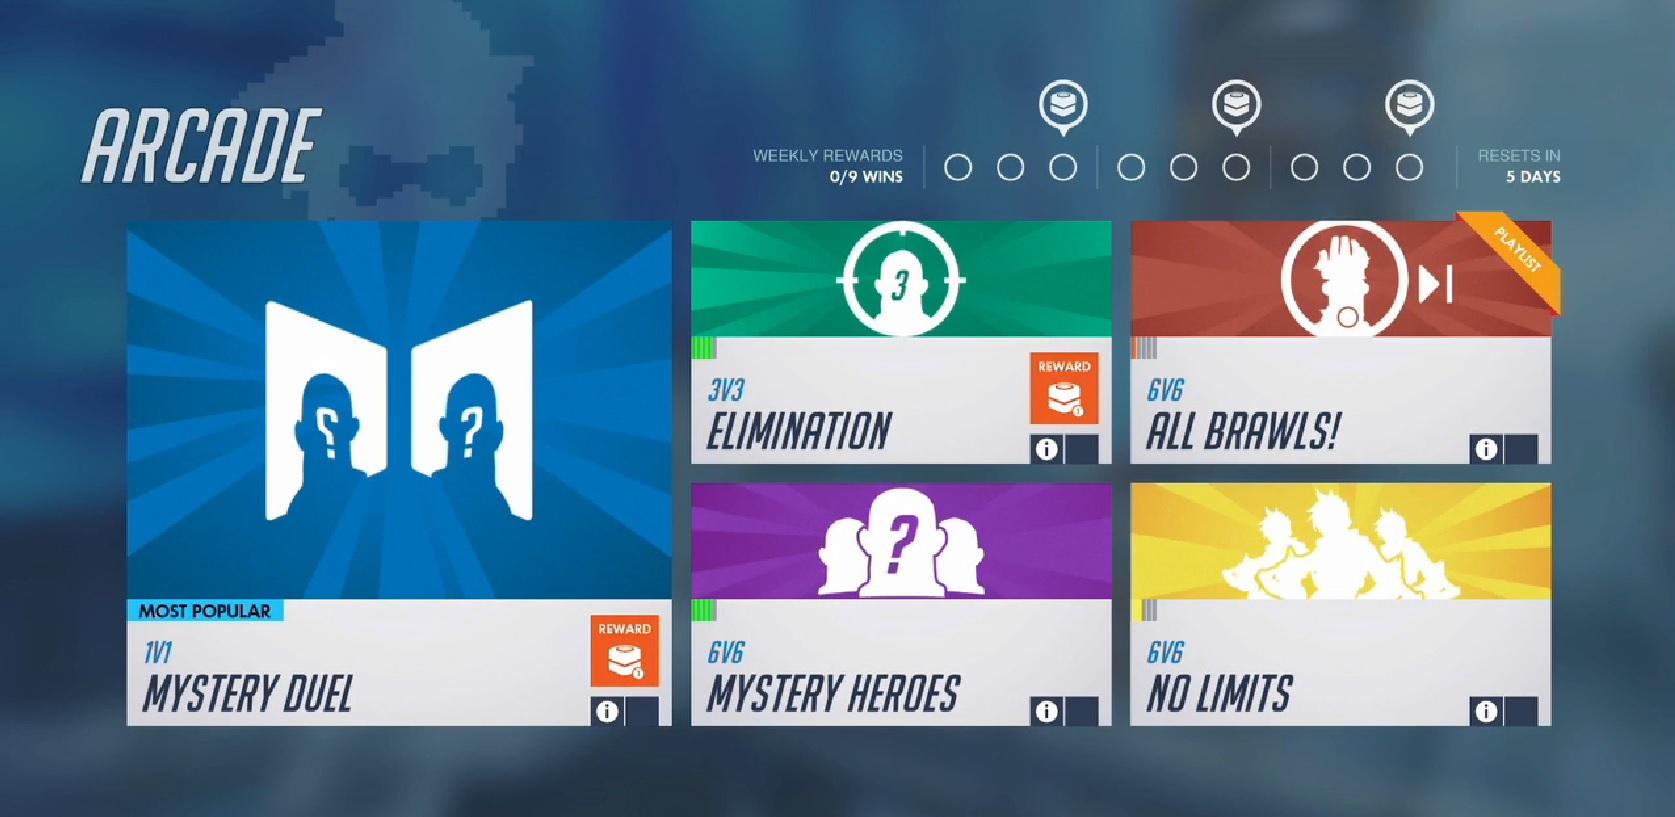 overwatch-arcade-menu